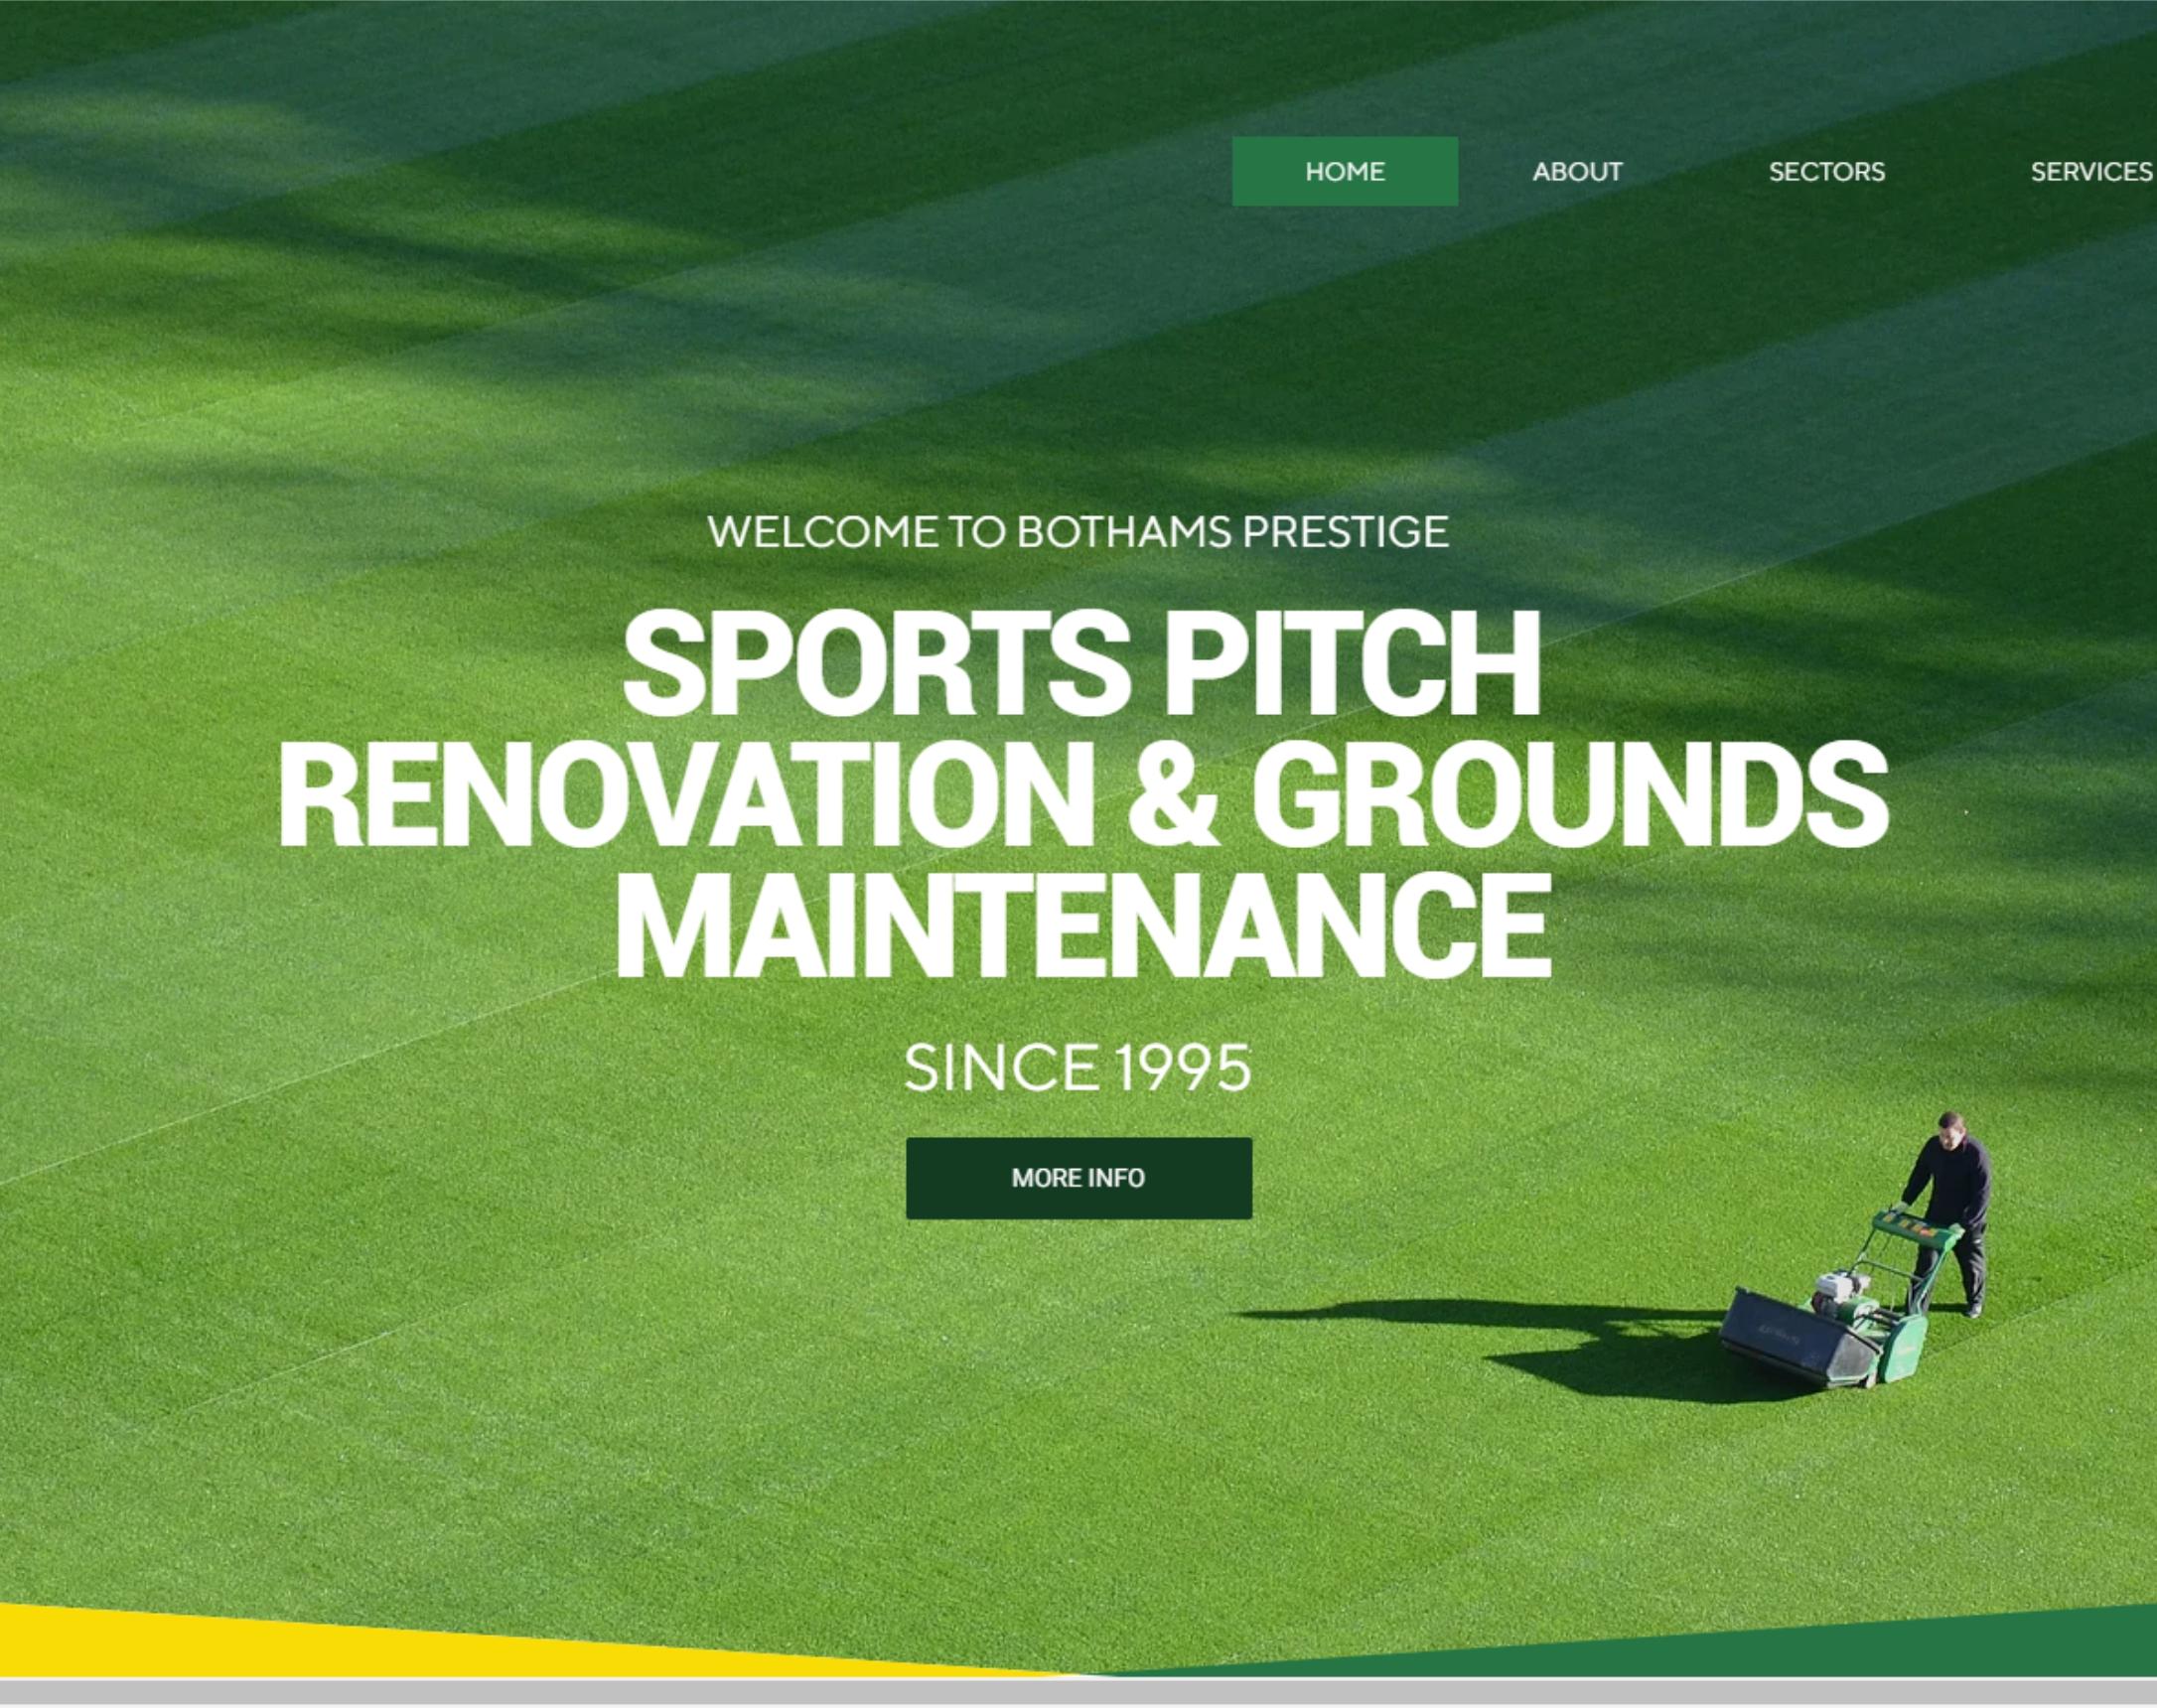 Bothams Prestige Bothams Prestige are providers of sports pitch ren...